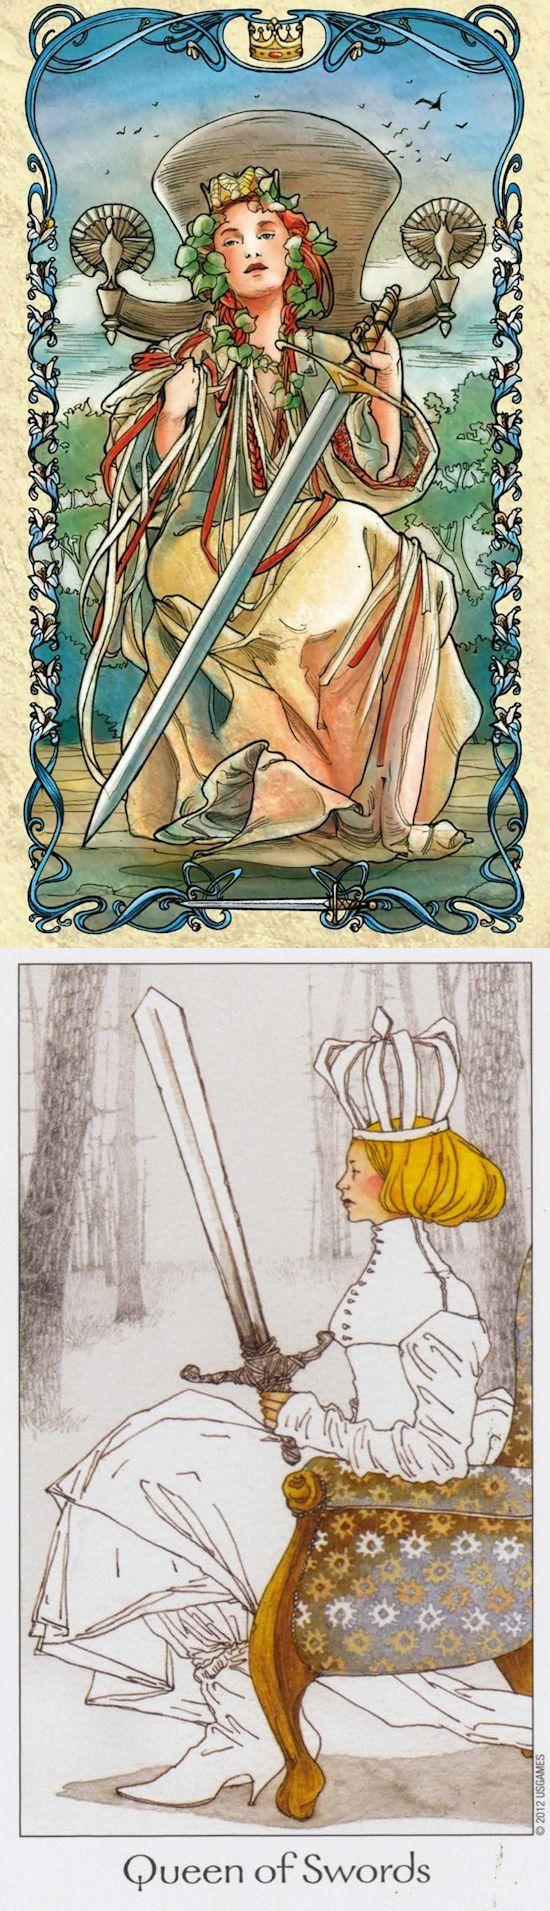 Queen of Swords: sharp-witted woman and cruel (reverse). Mucha Tarot deck and Dreaming Way Tarot deck: tarotin wonderland, free internet tarot and lotus tarot card reading. The best tarot altar and lenormand cards decks.